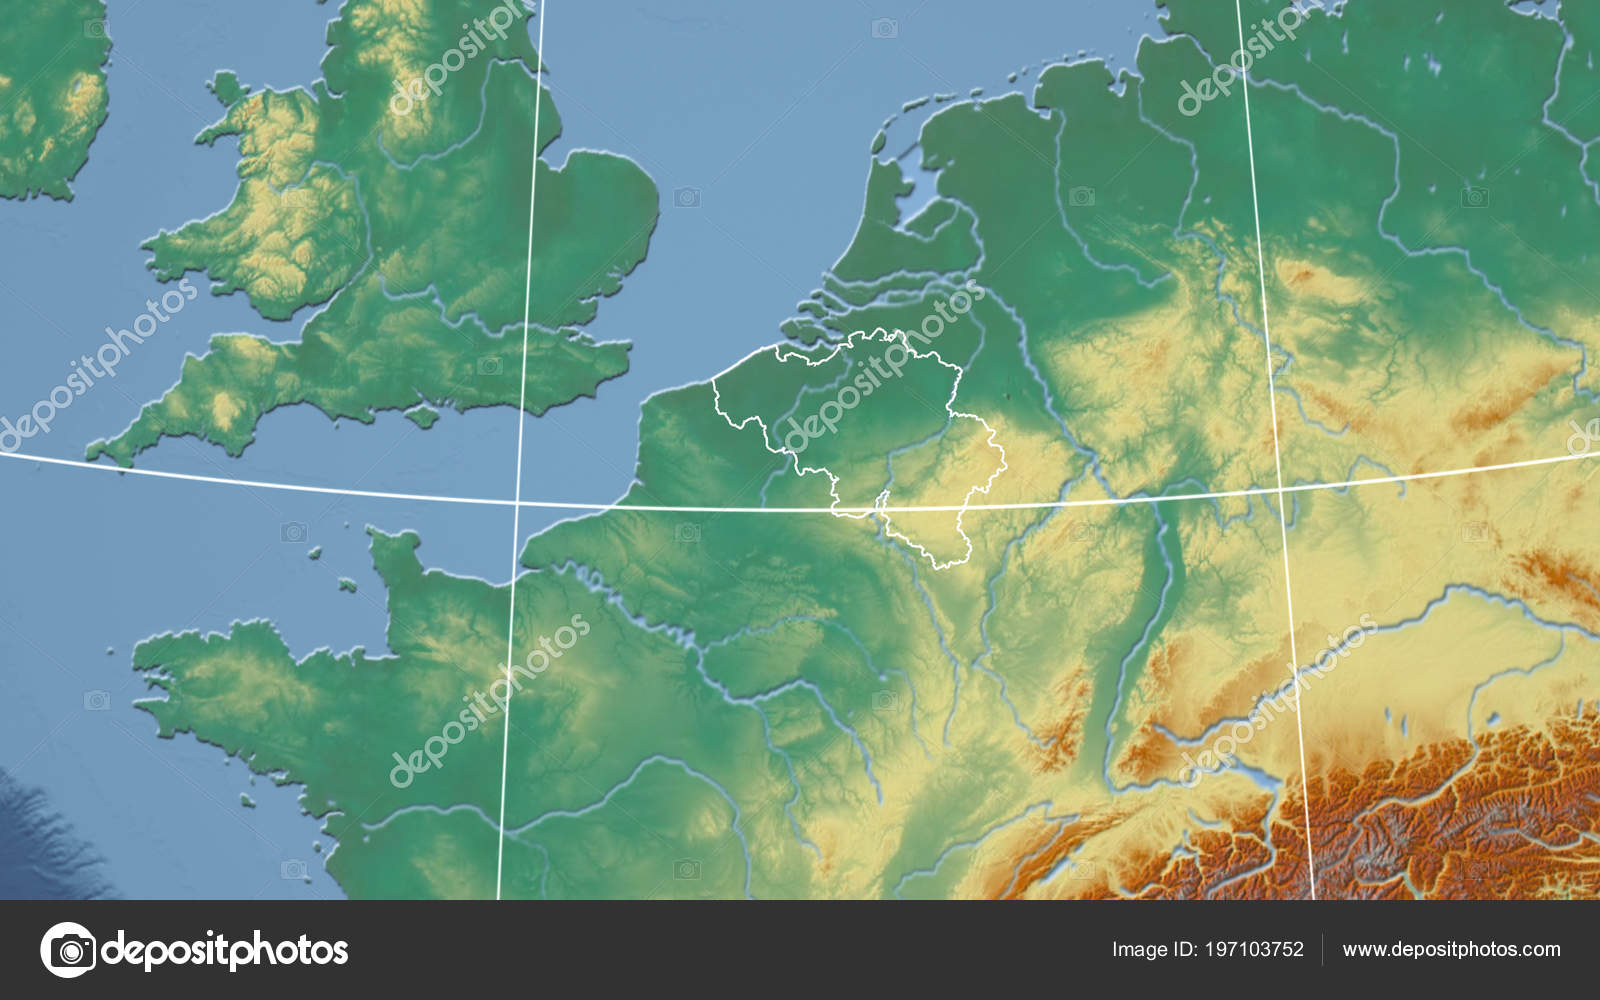 Belgium Topographic Map.Belgium Neighborhood Distant Perspective Outline Country Topographic